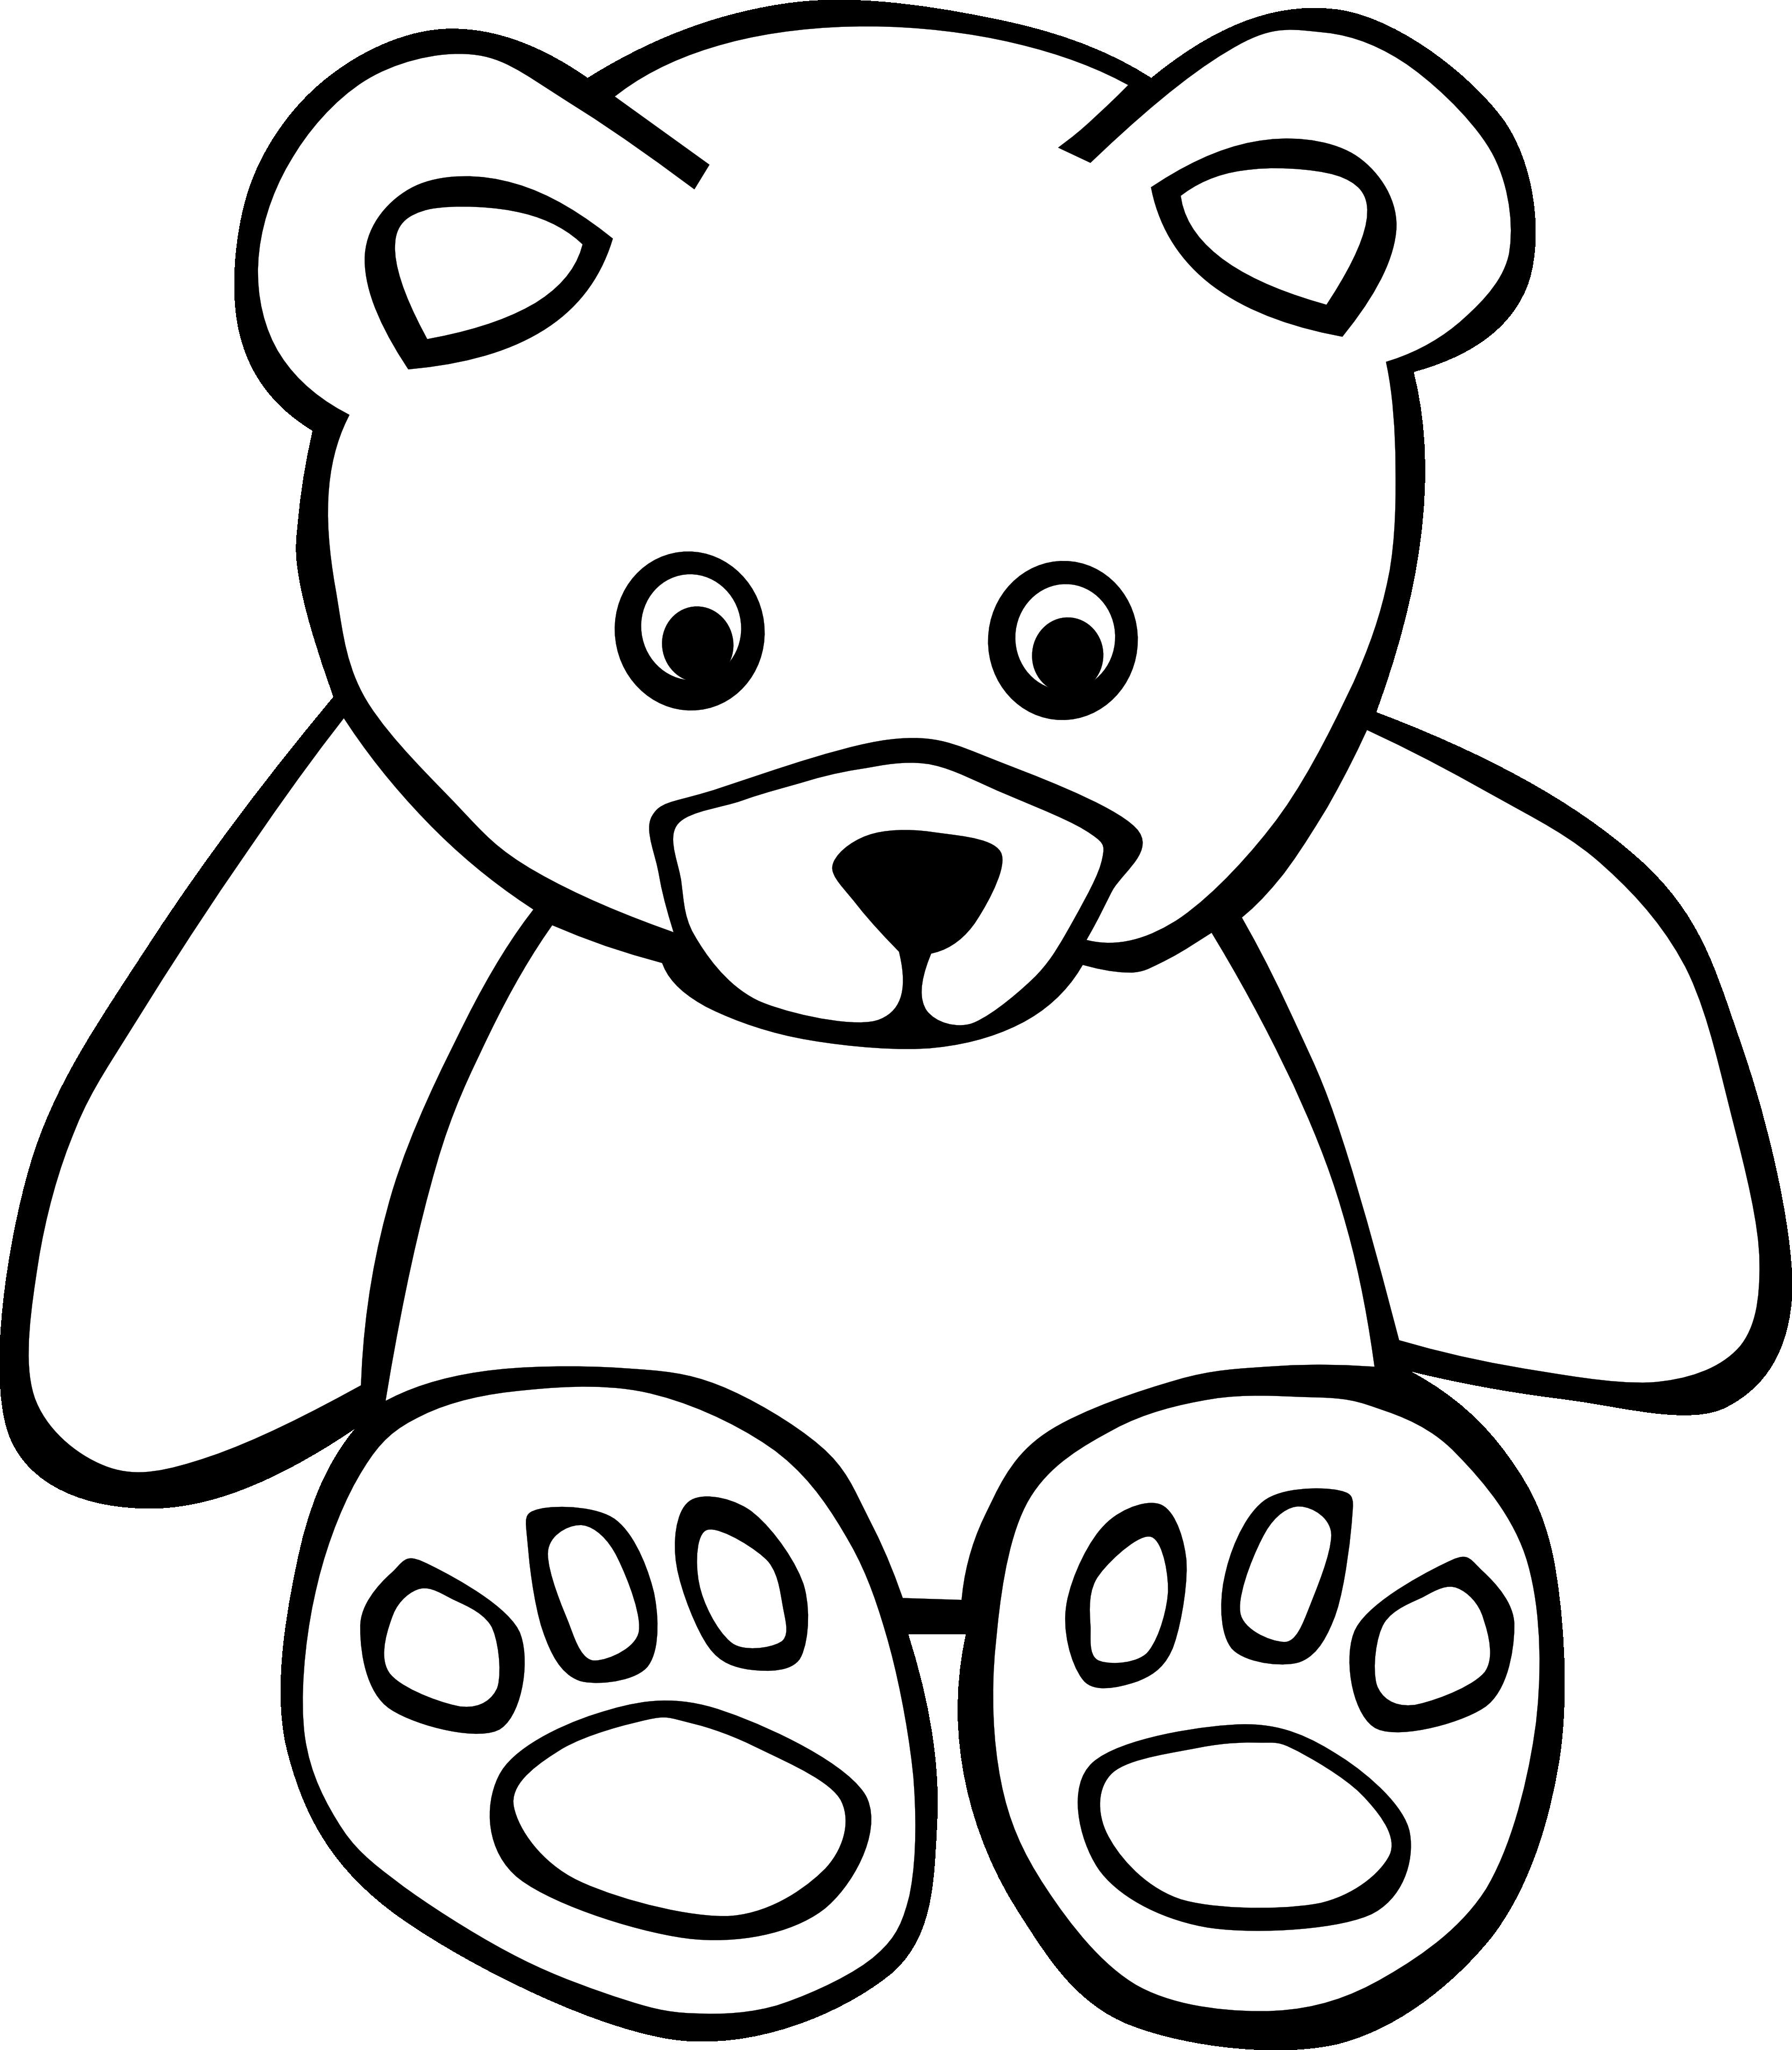 Teddy bear black and white teddy bear clipart black and.